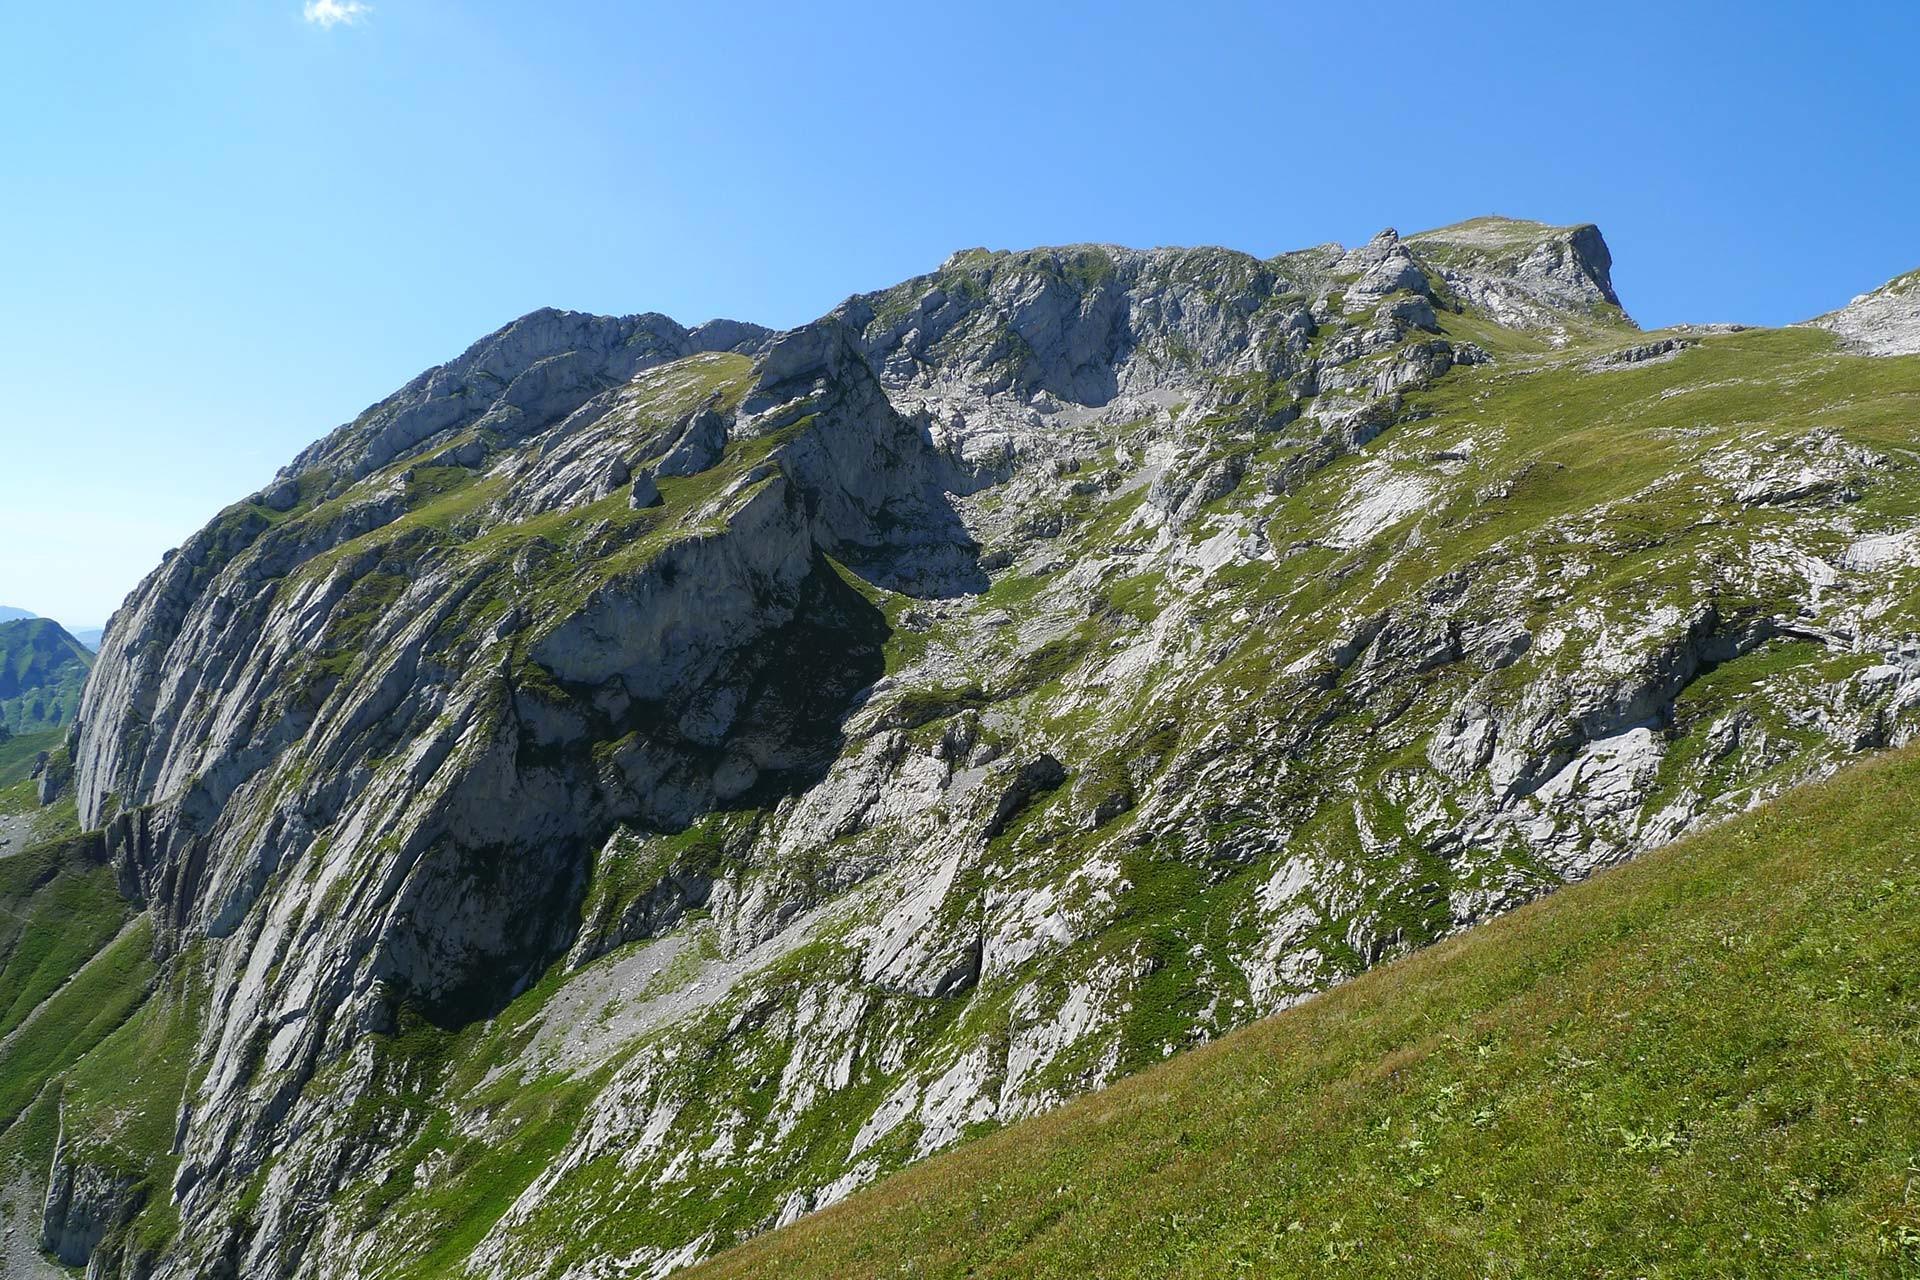 Alpinisme, Haute Montagne